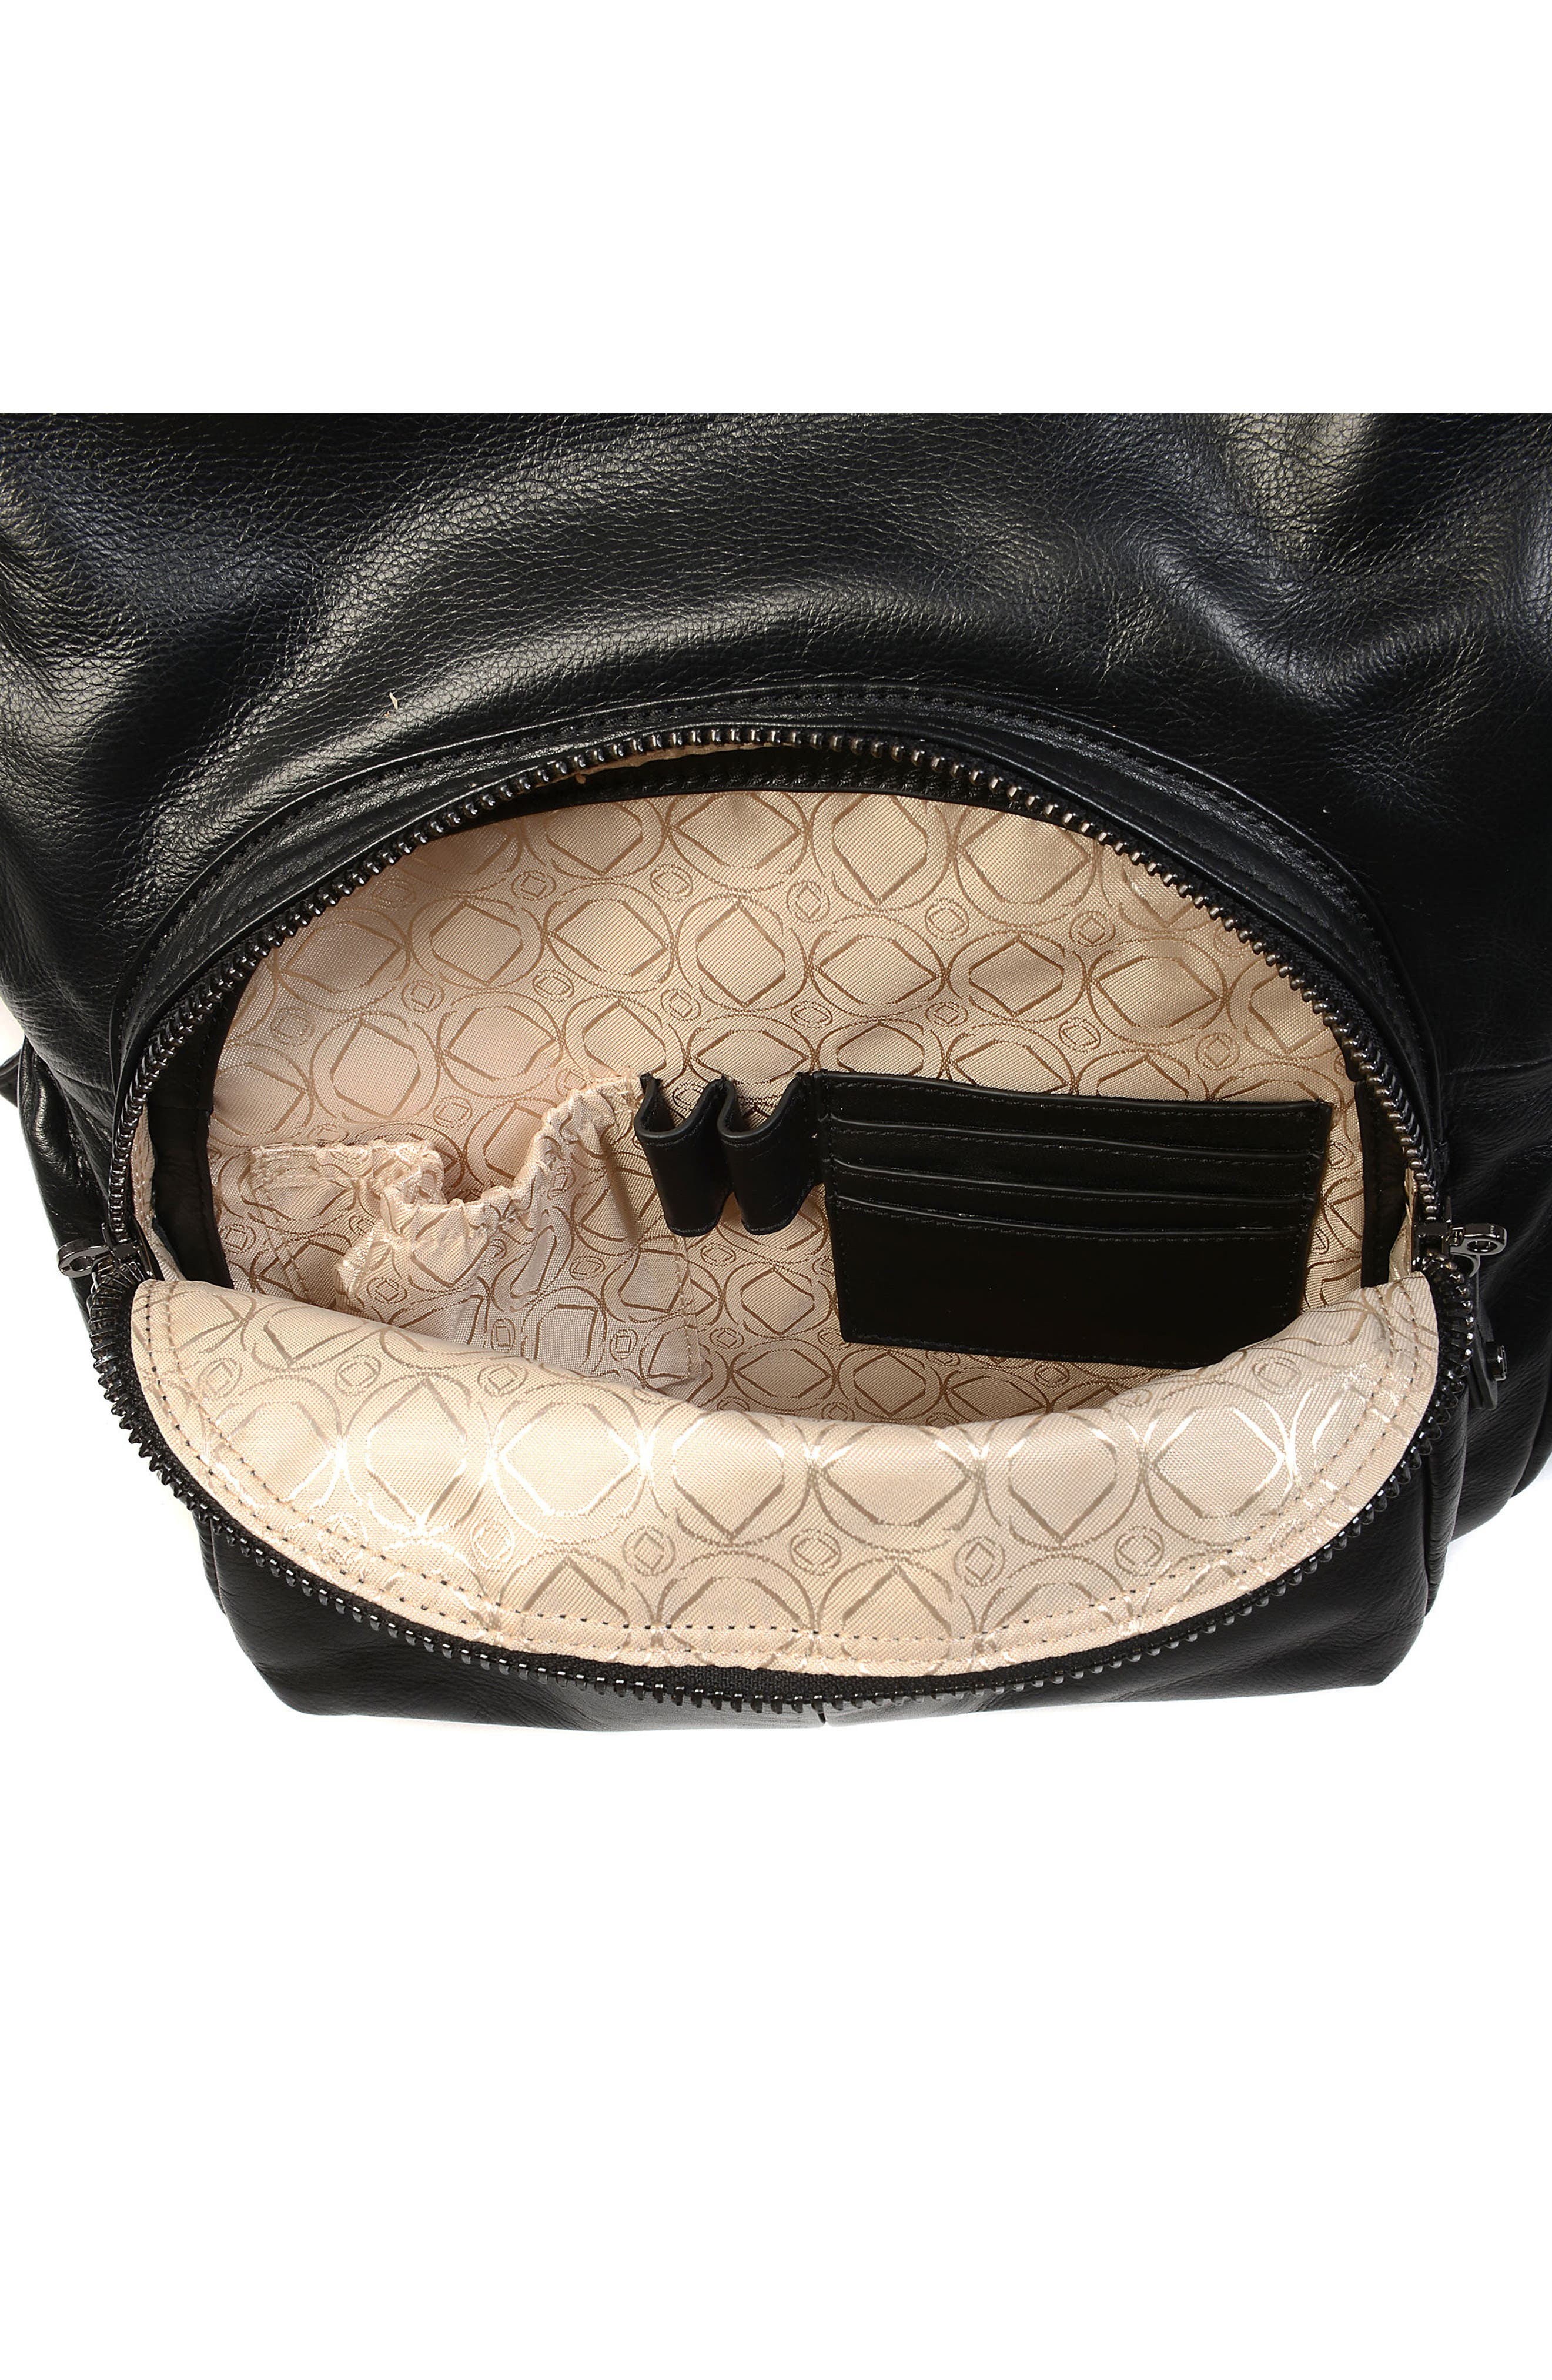 Joy XL Leather Backpack,                             Alternate thumbnail 9, color,                             Black